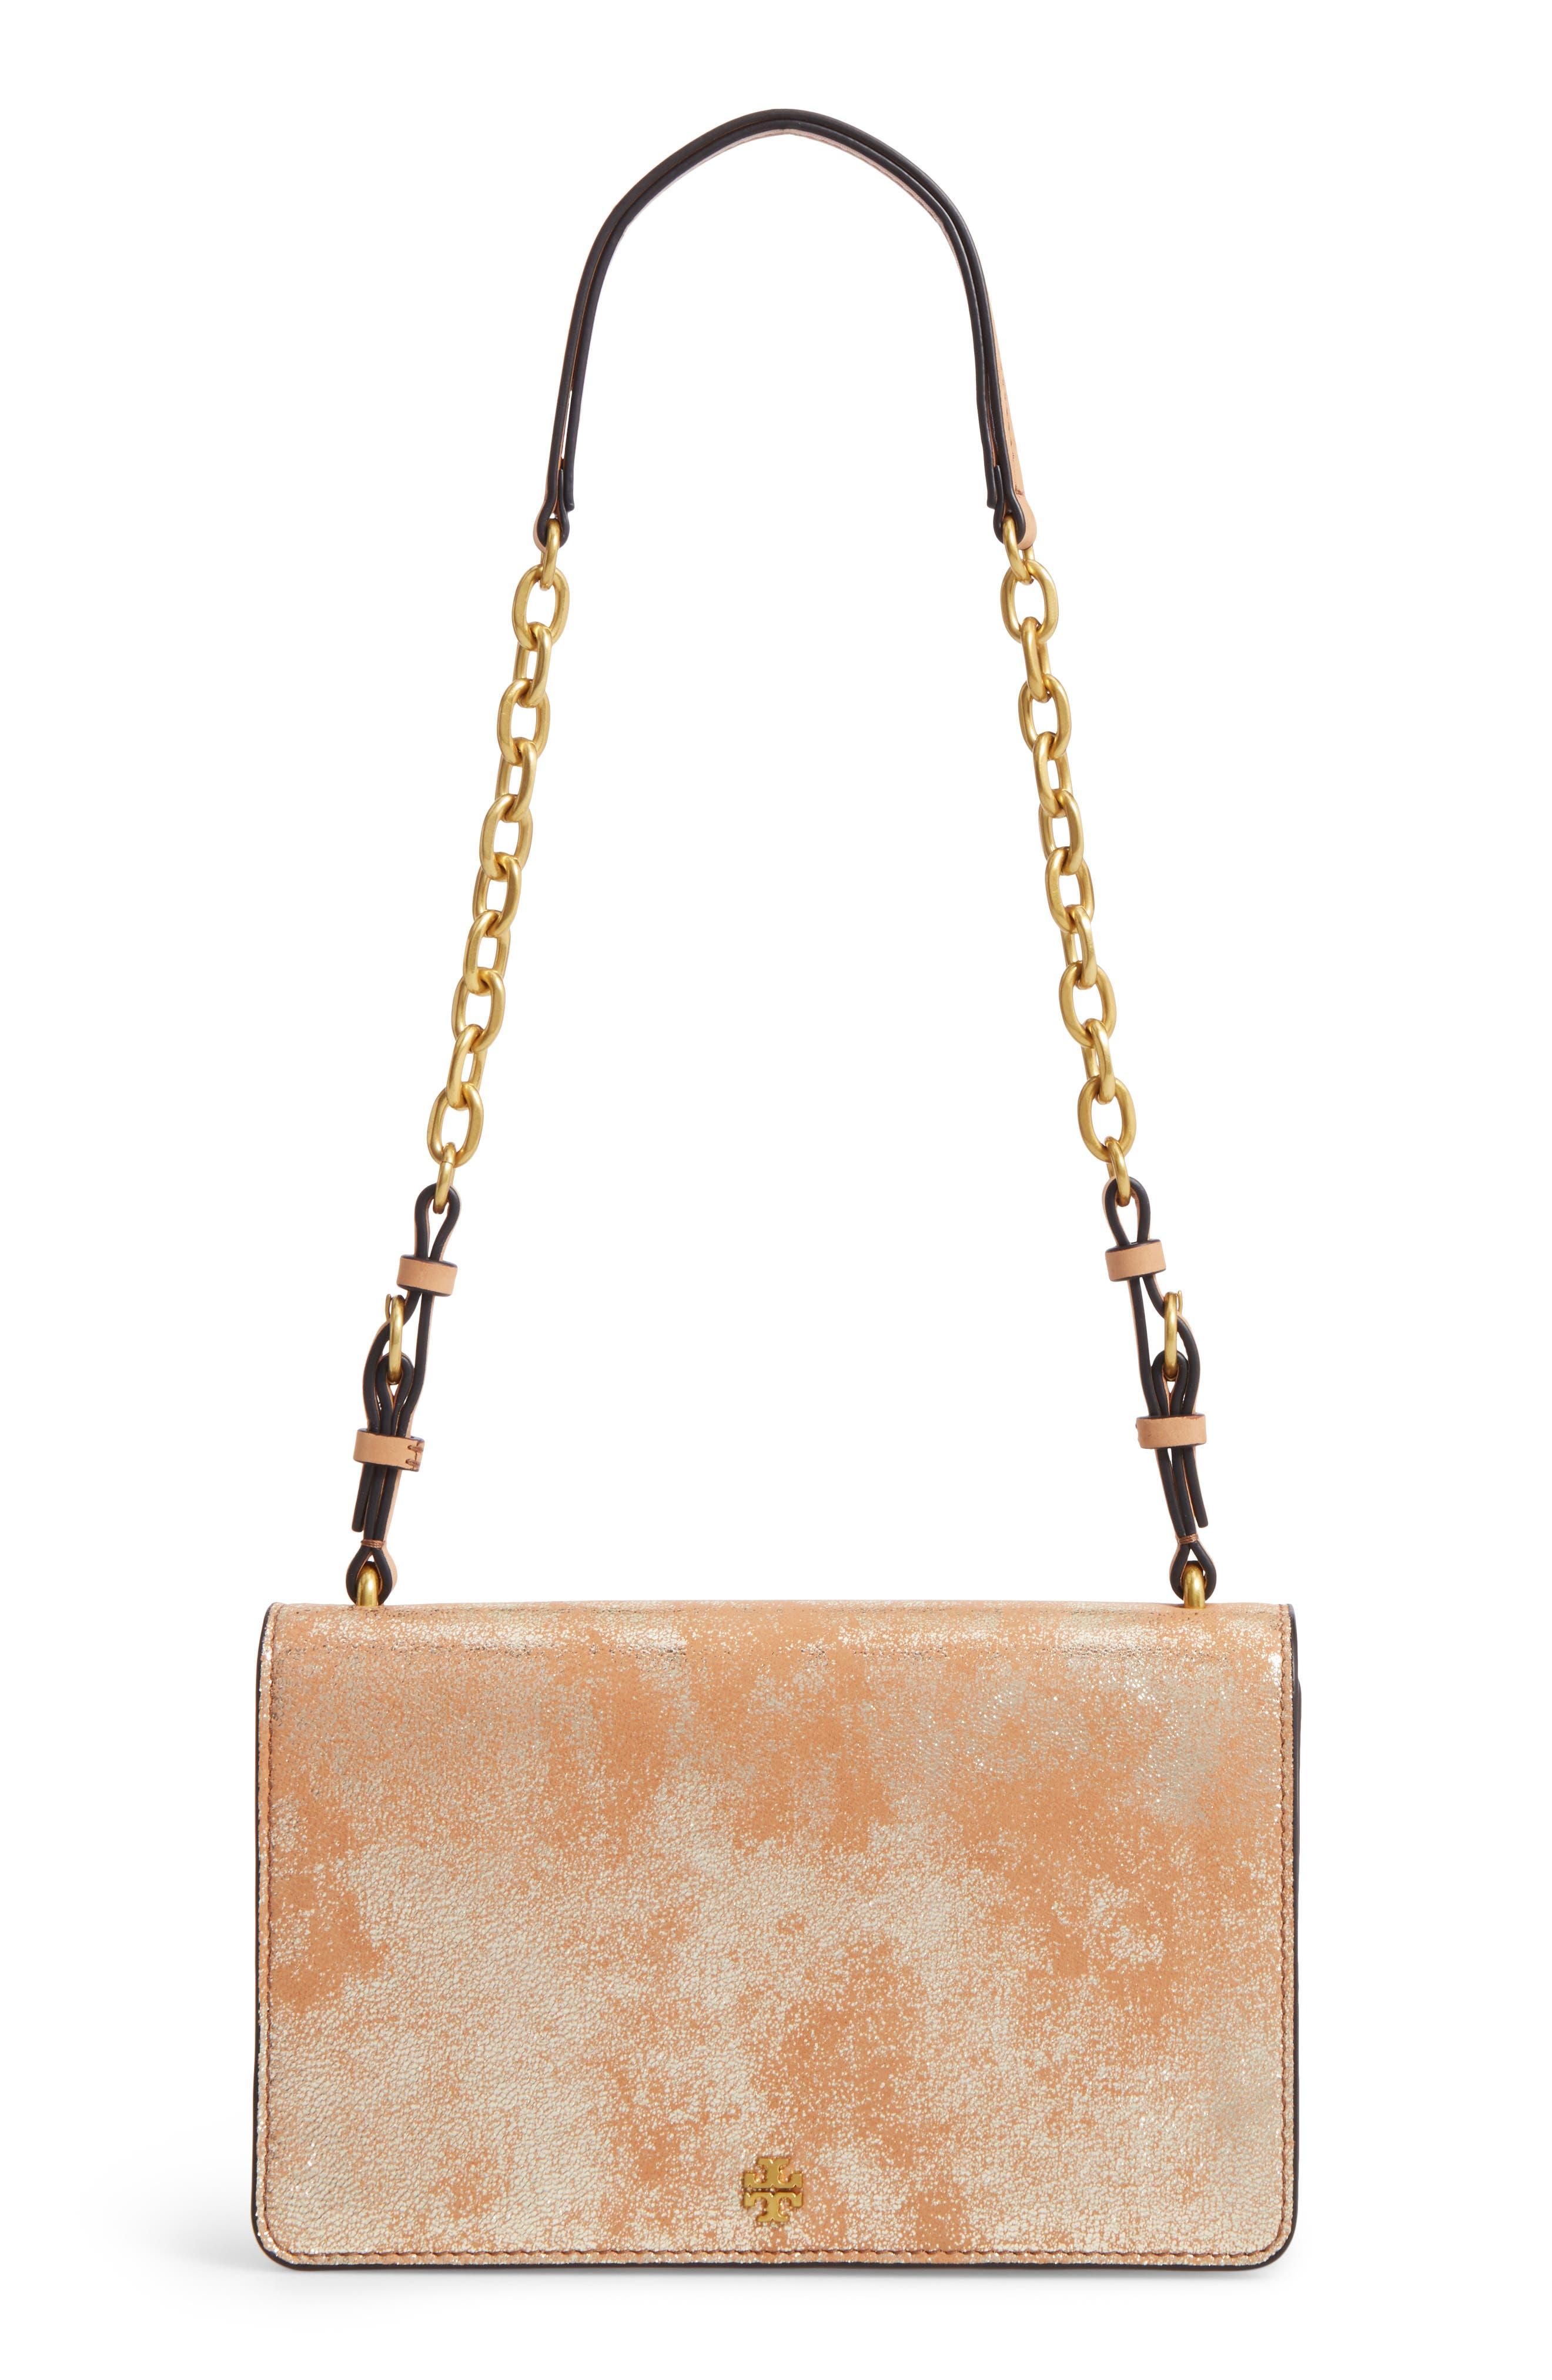 TORY BURCH Sadie Metallic Leather Shoulder Bag